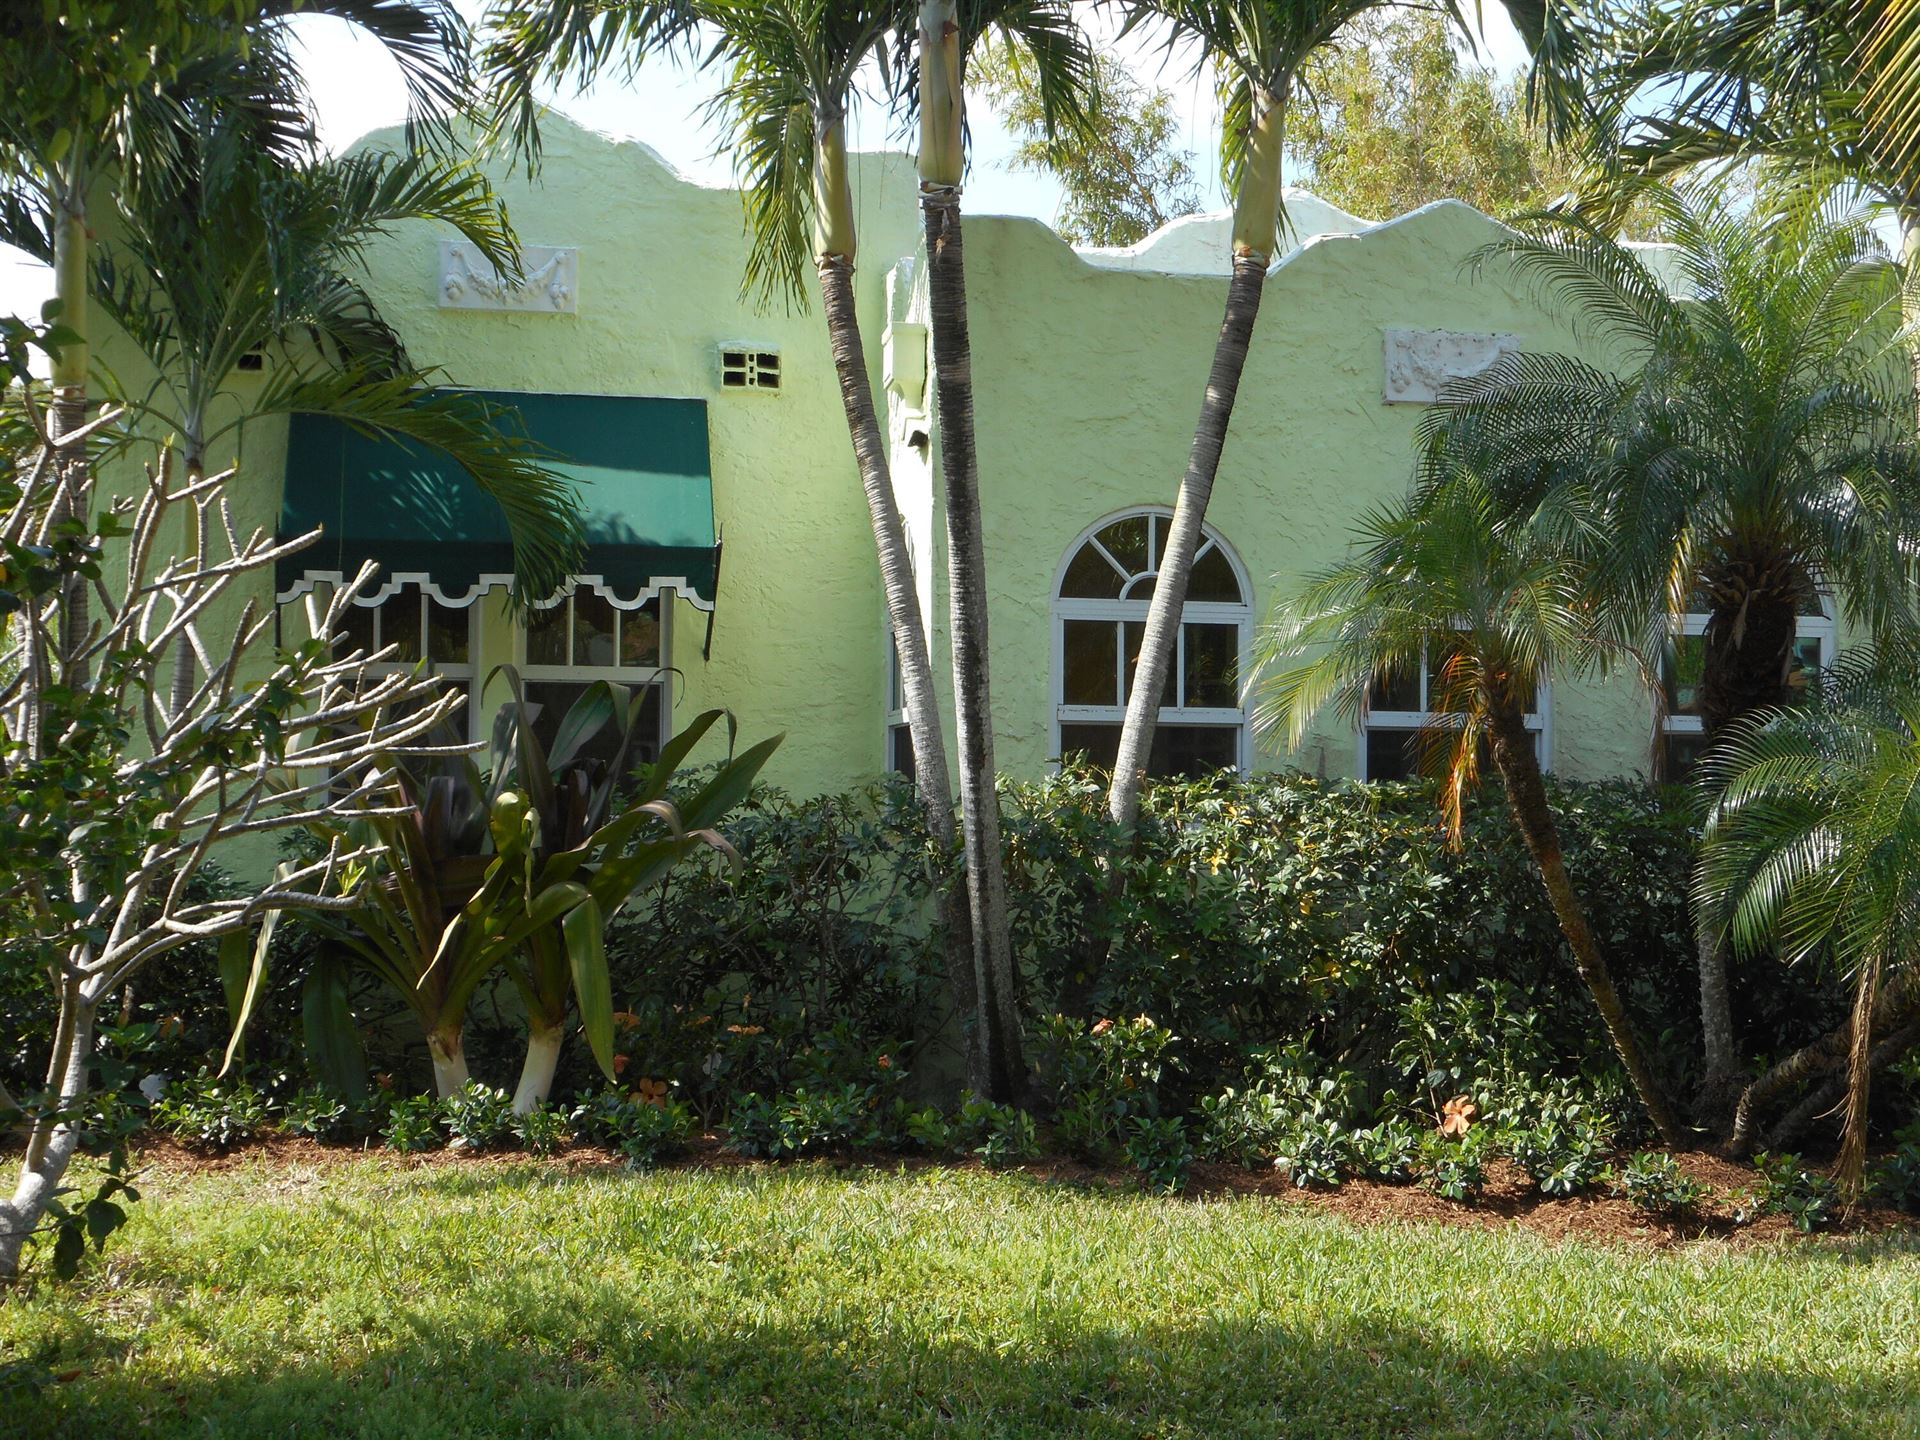 Photo of 822 Flamingo Drive, West Palm Beach, FL 33401 (MLS # RX-10708566)